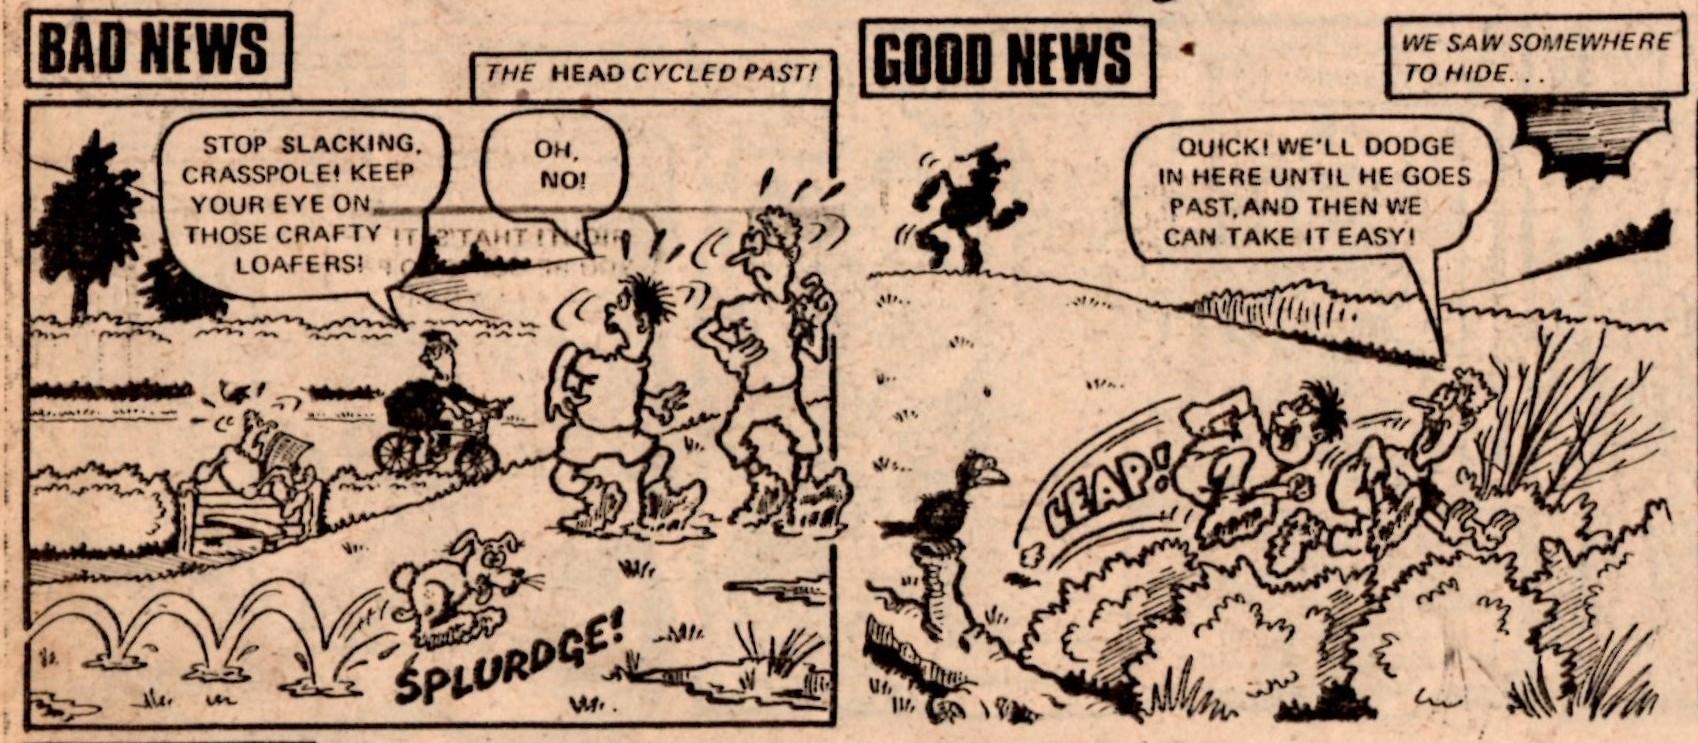 Good News Bad News: Nigel Edwards (artist)